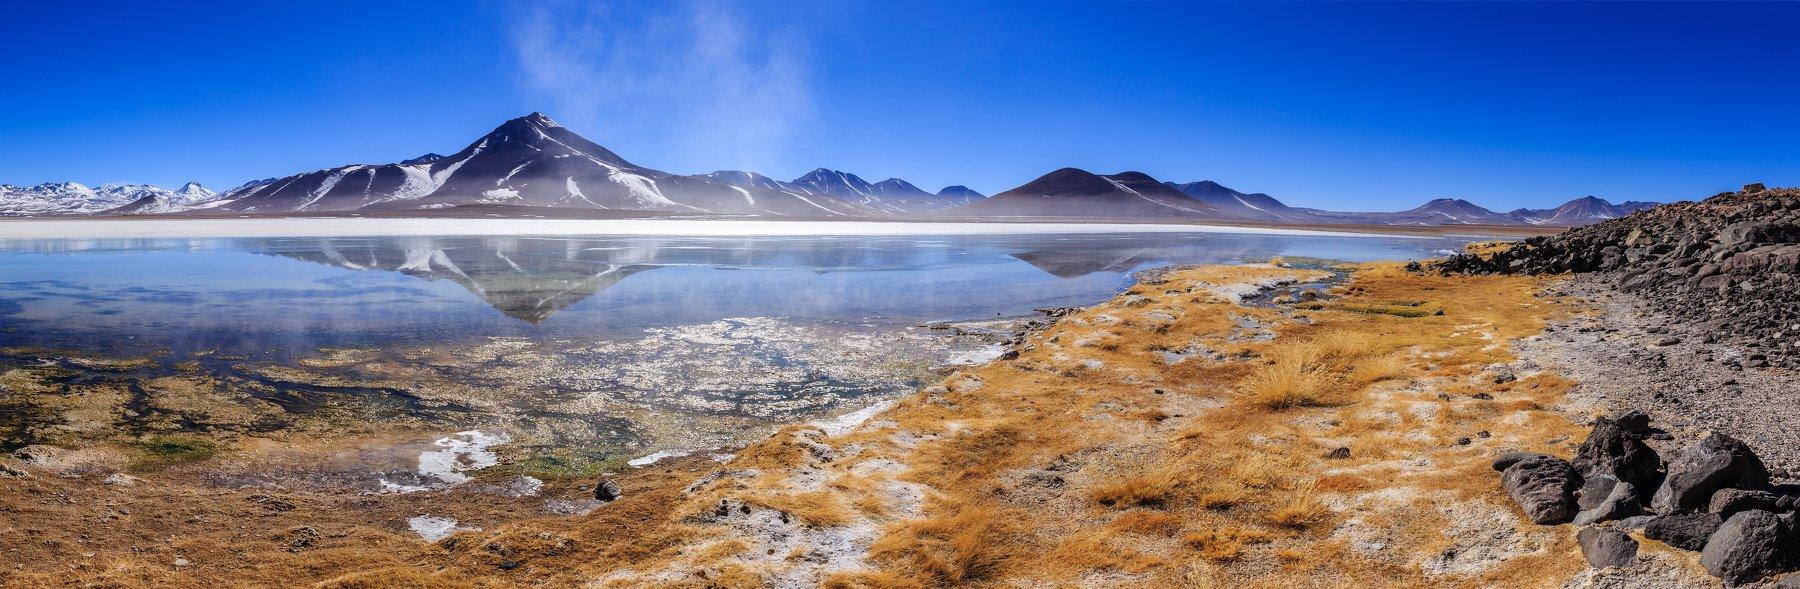 Bolivia, Altiplano, Laguna Blanca, Vitalis Vasylius